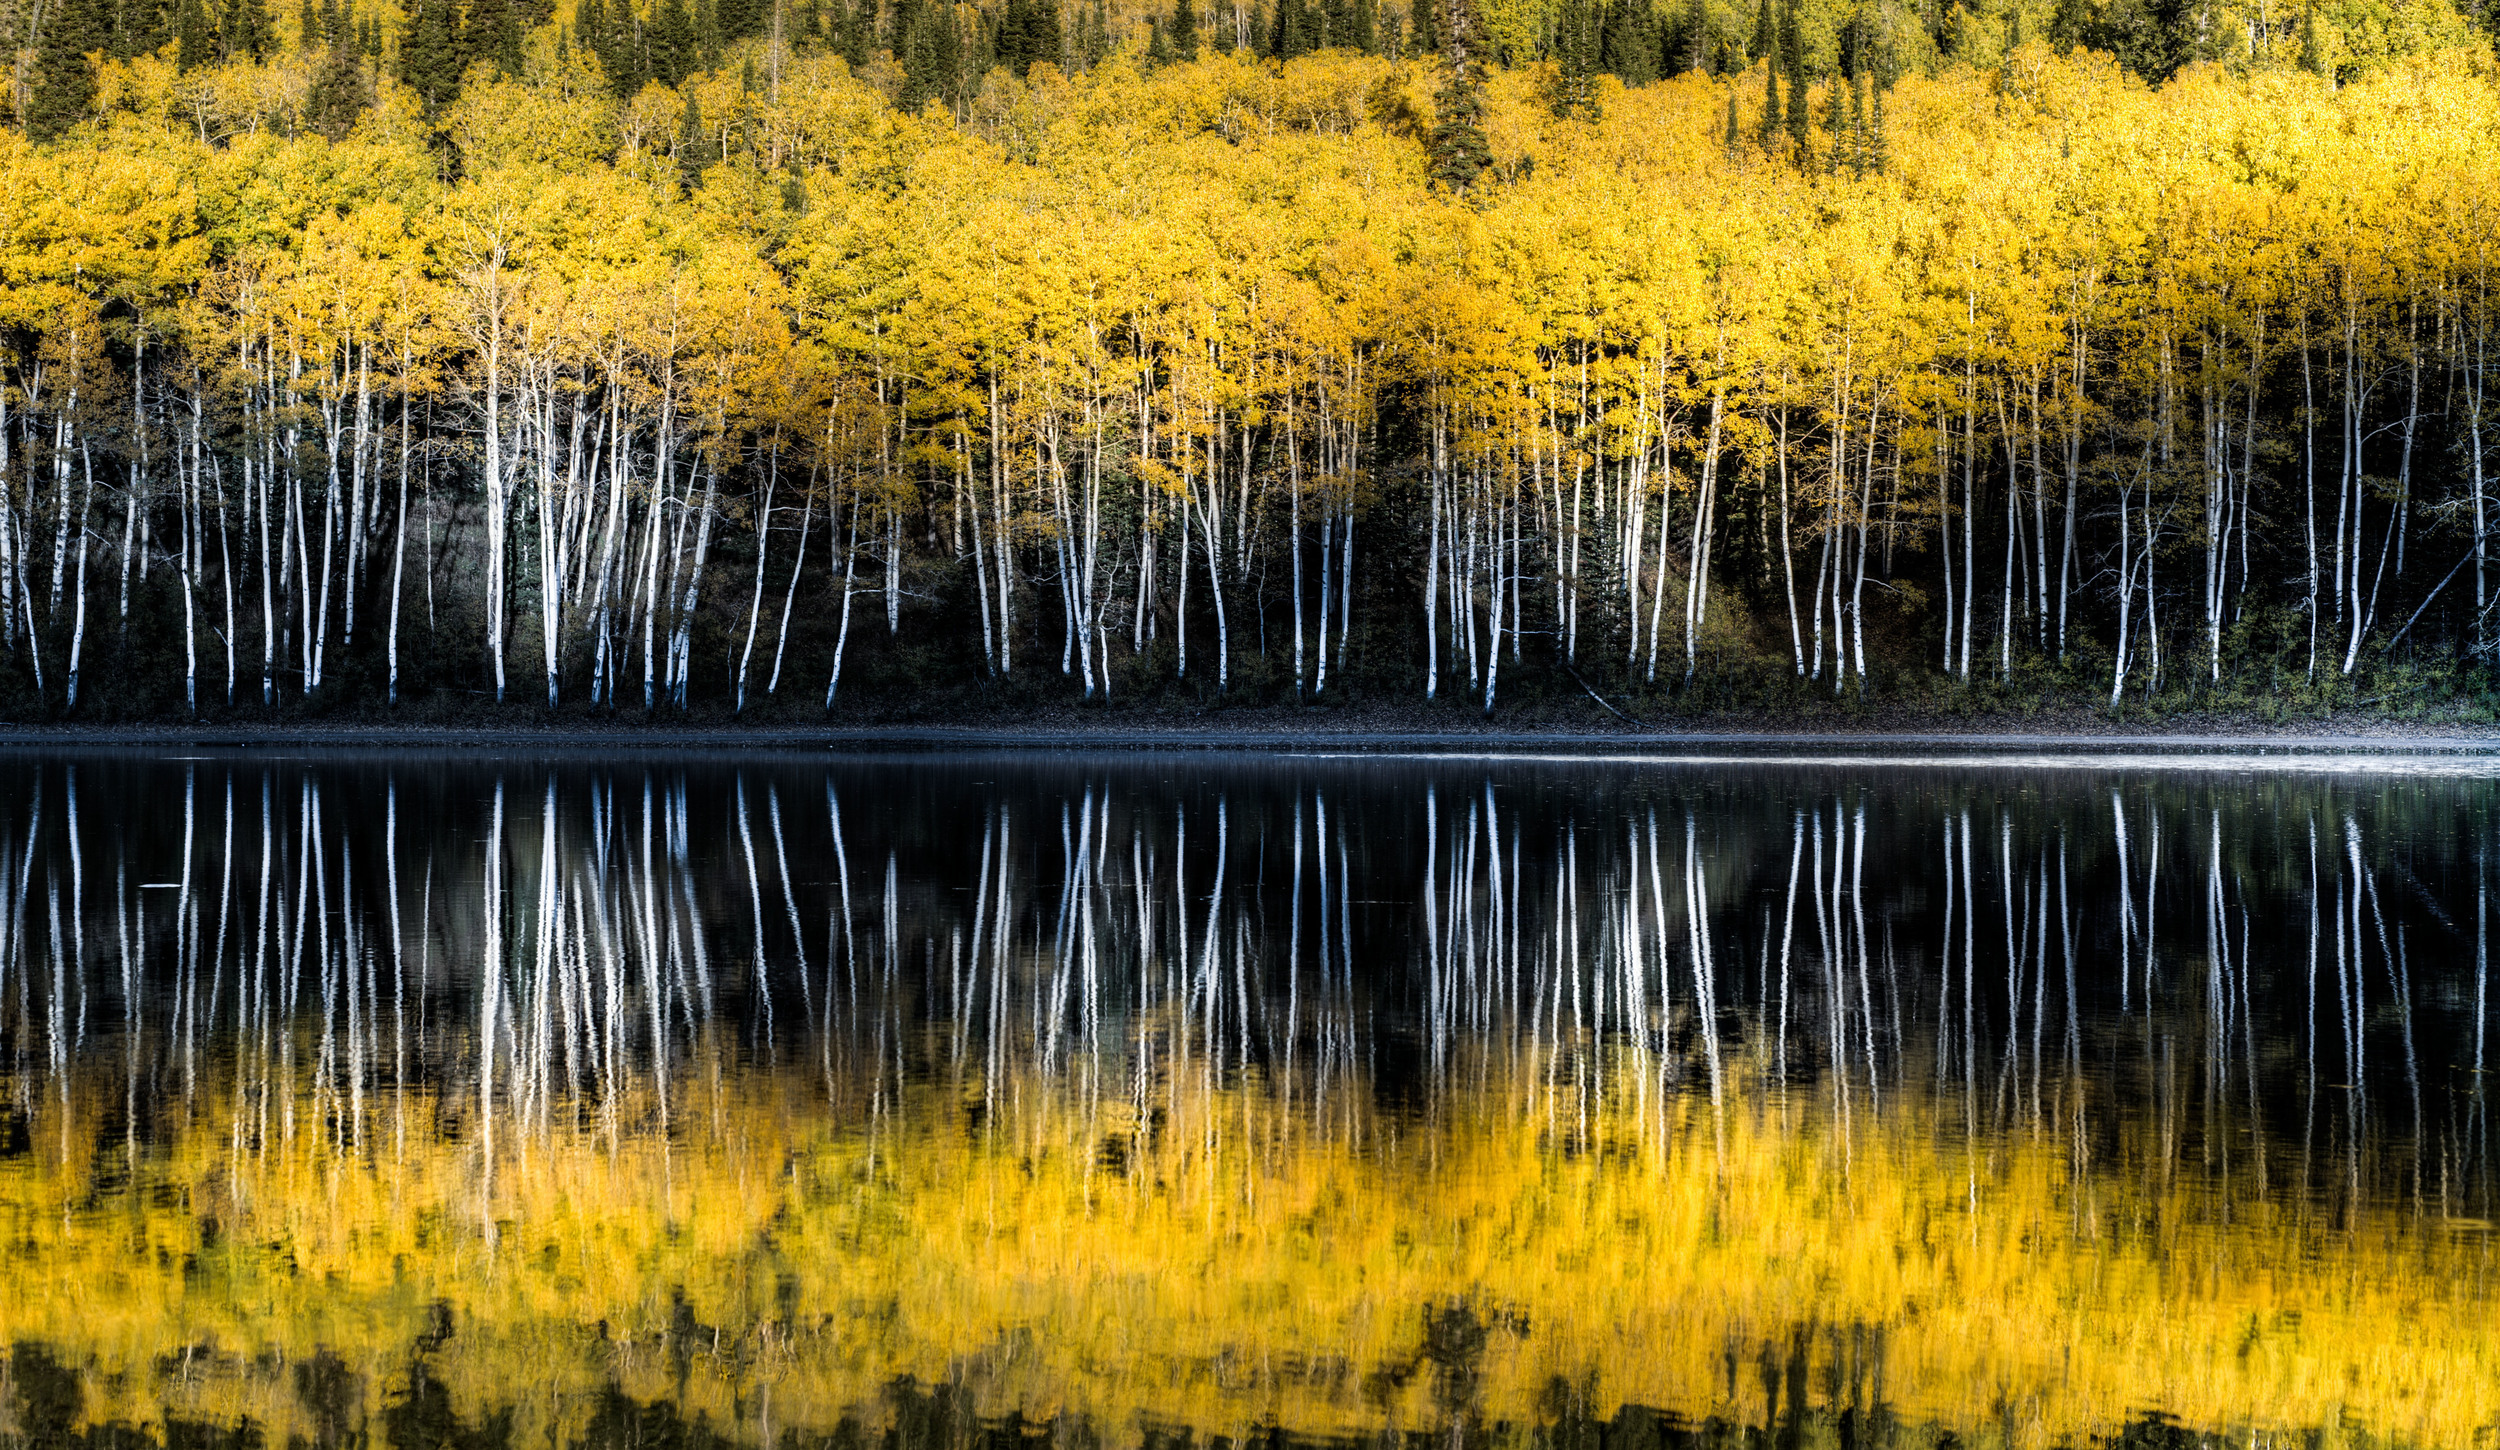 lake reflection trees kasey crook thisworldexists